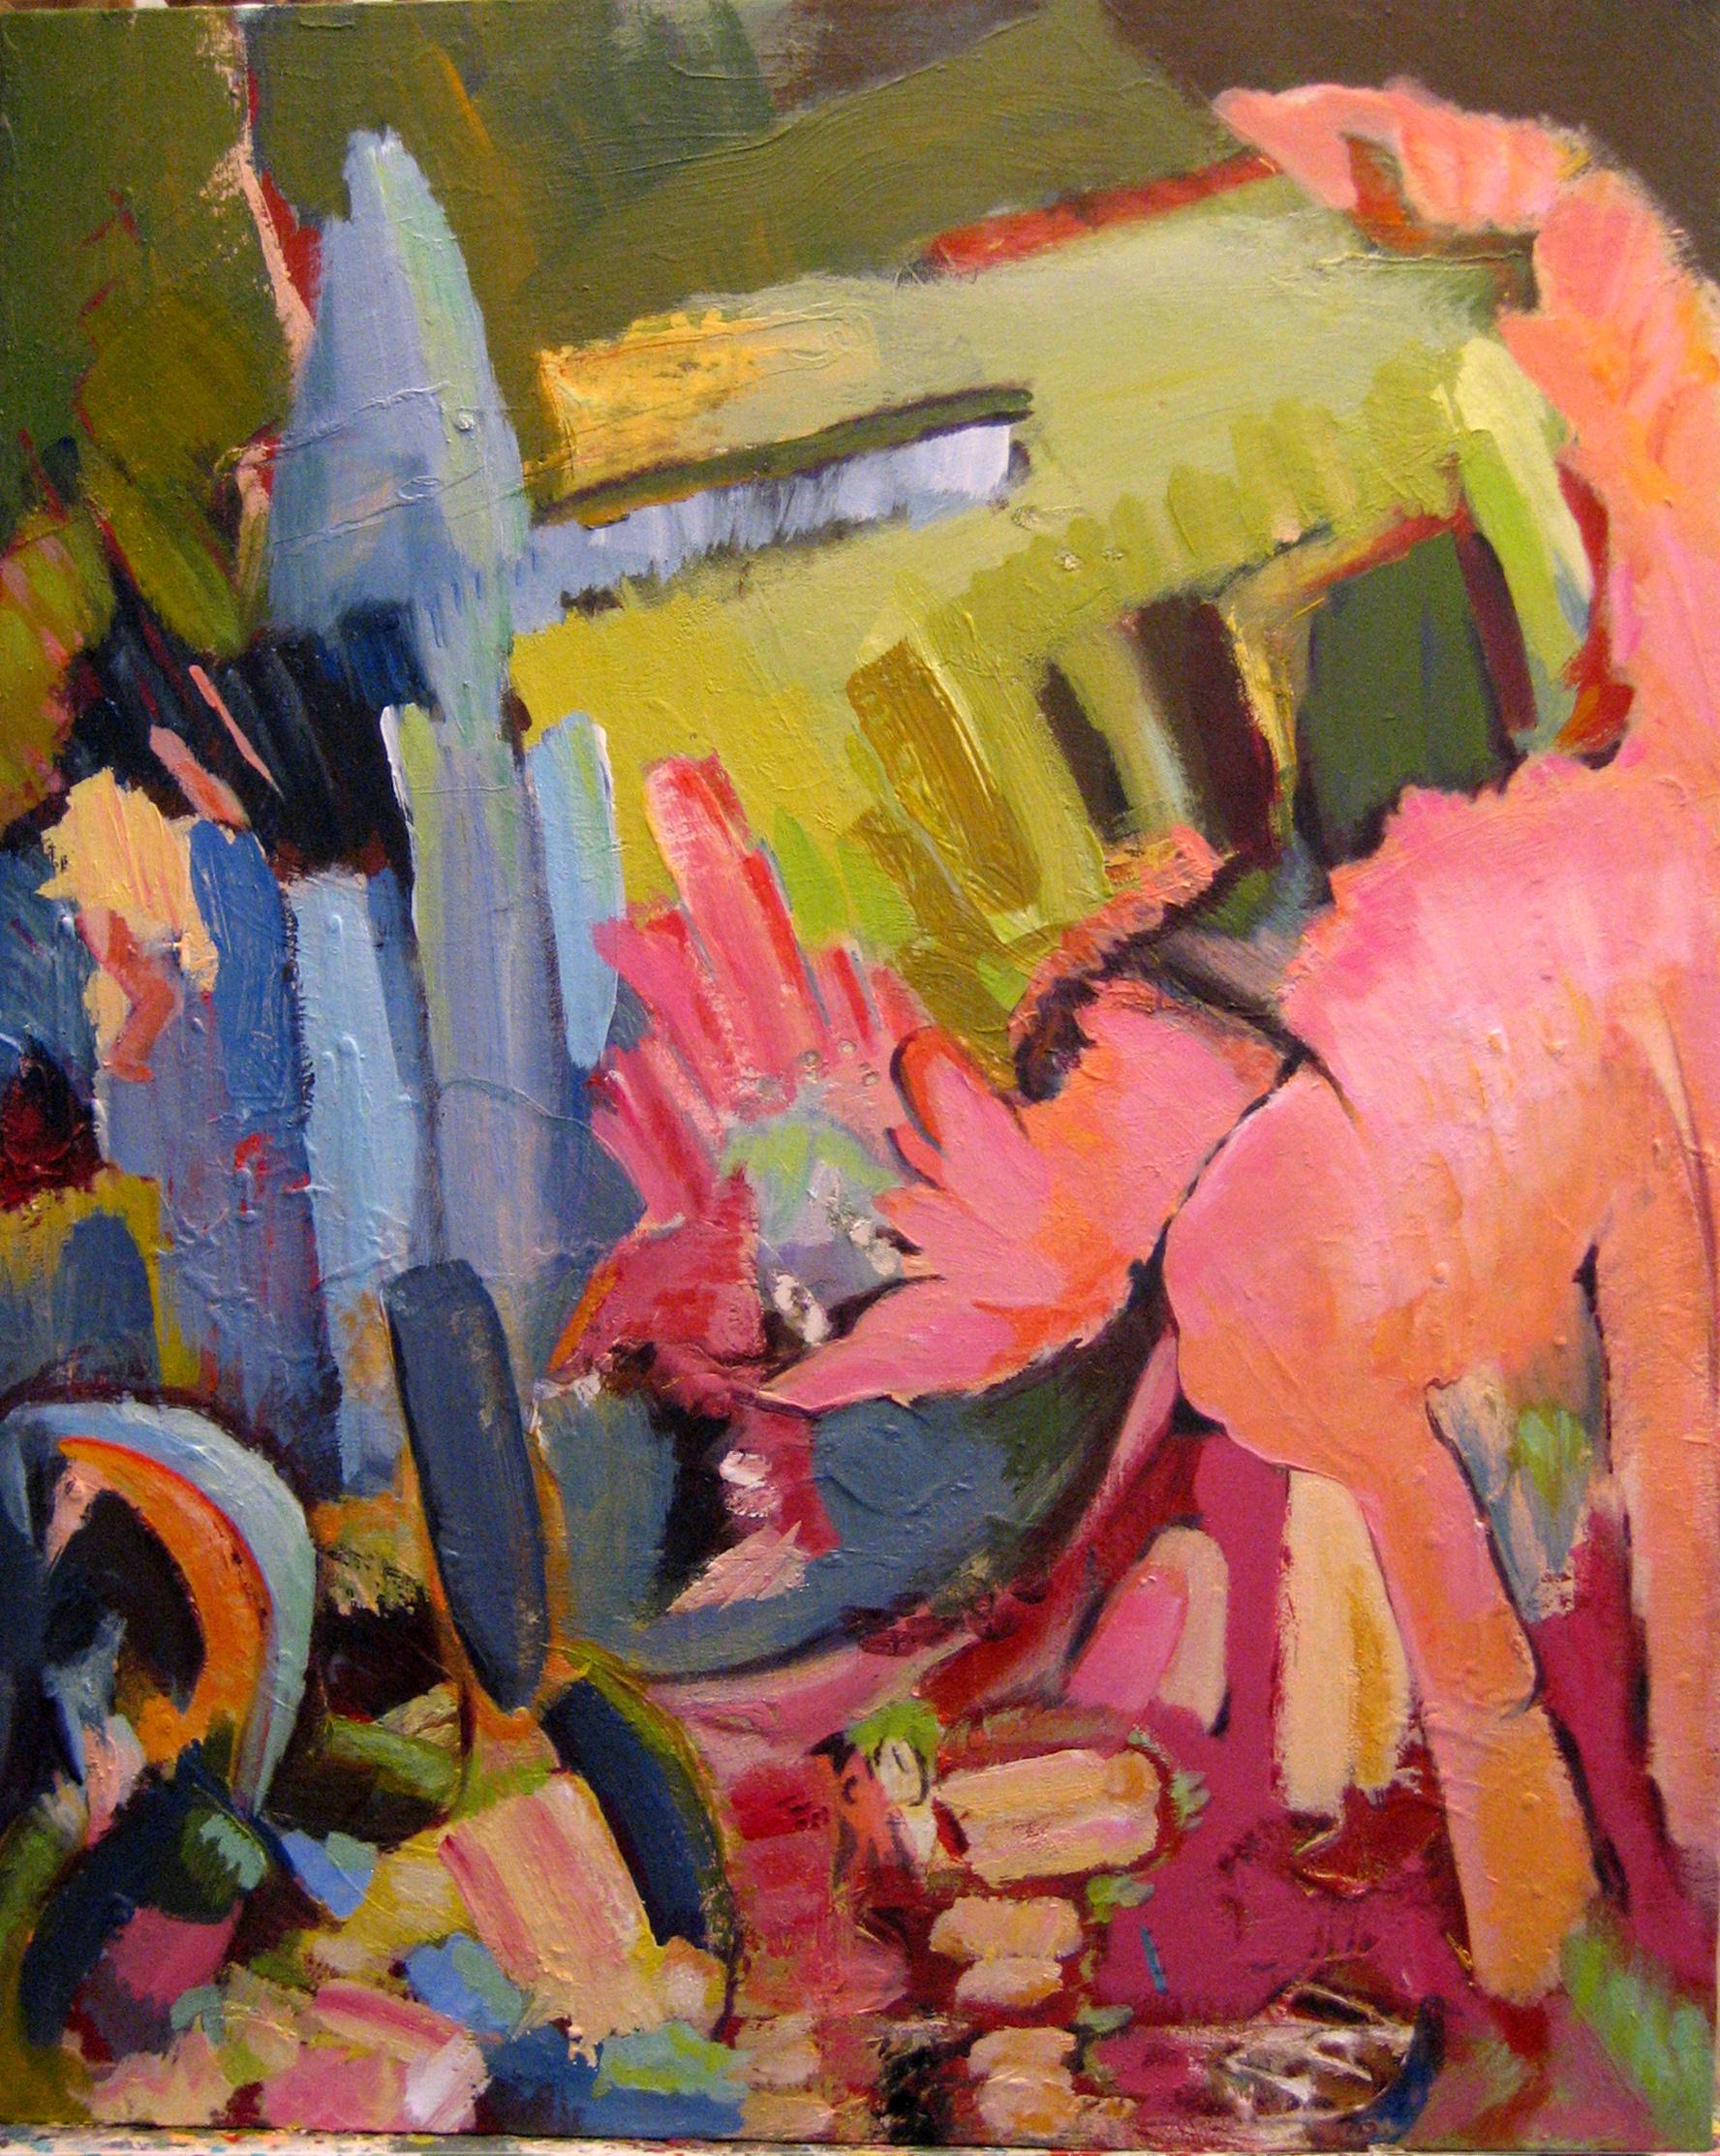 Untitled - 2008